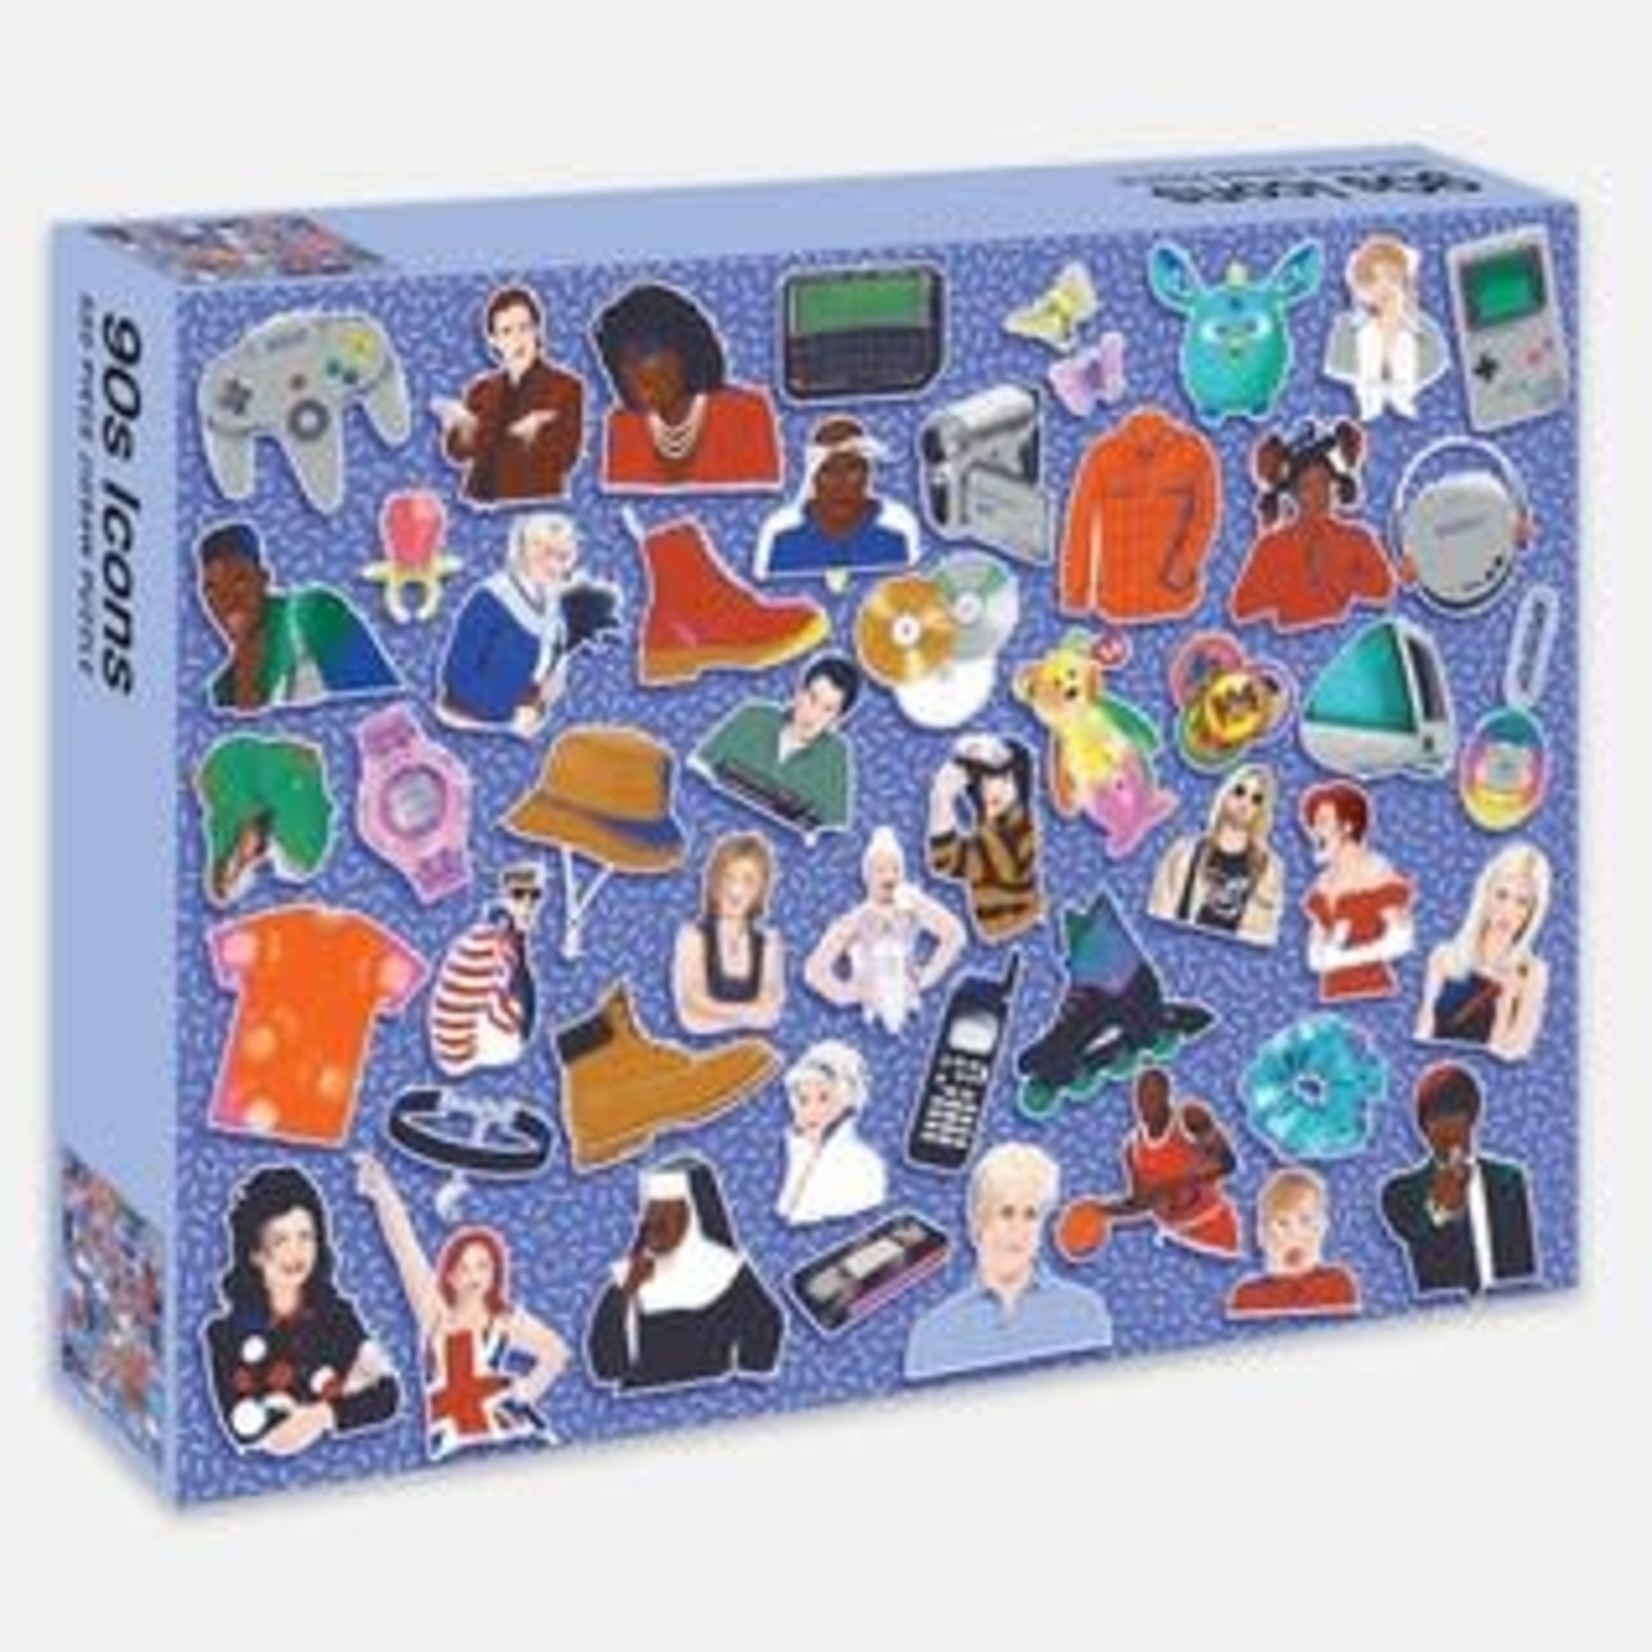 Rizzoli 500 Piece Jigsaw Puzzle 90s Icons